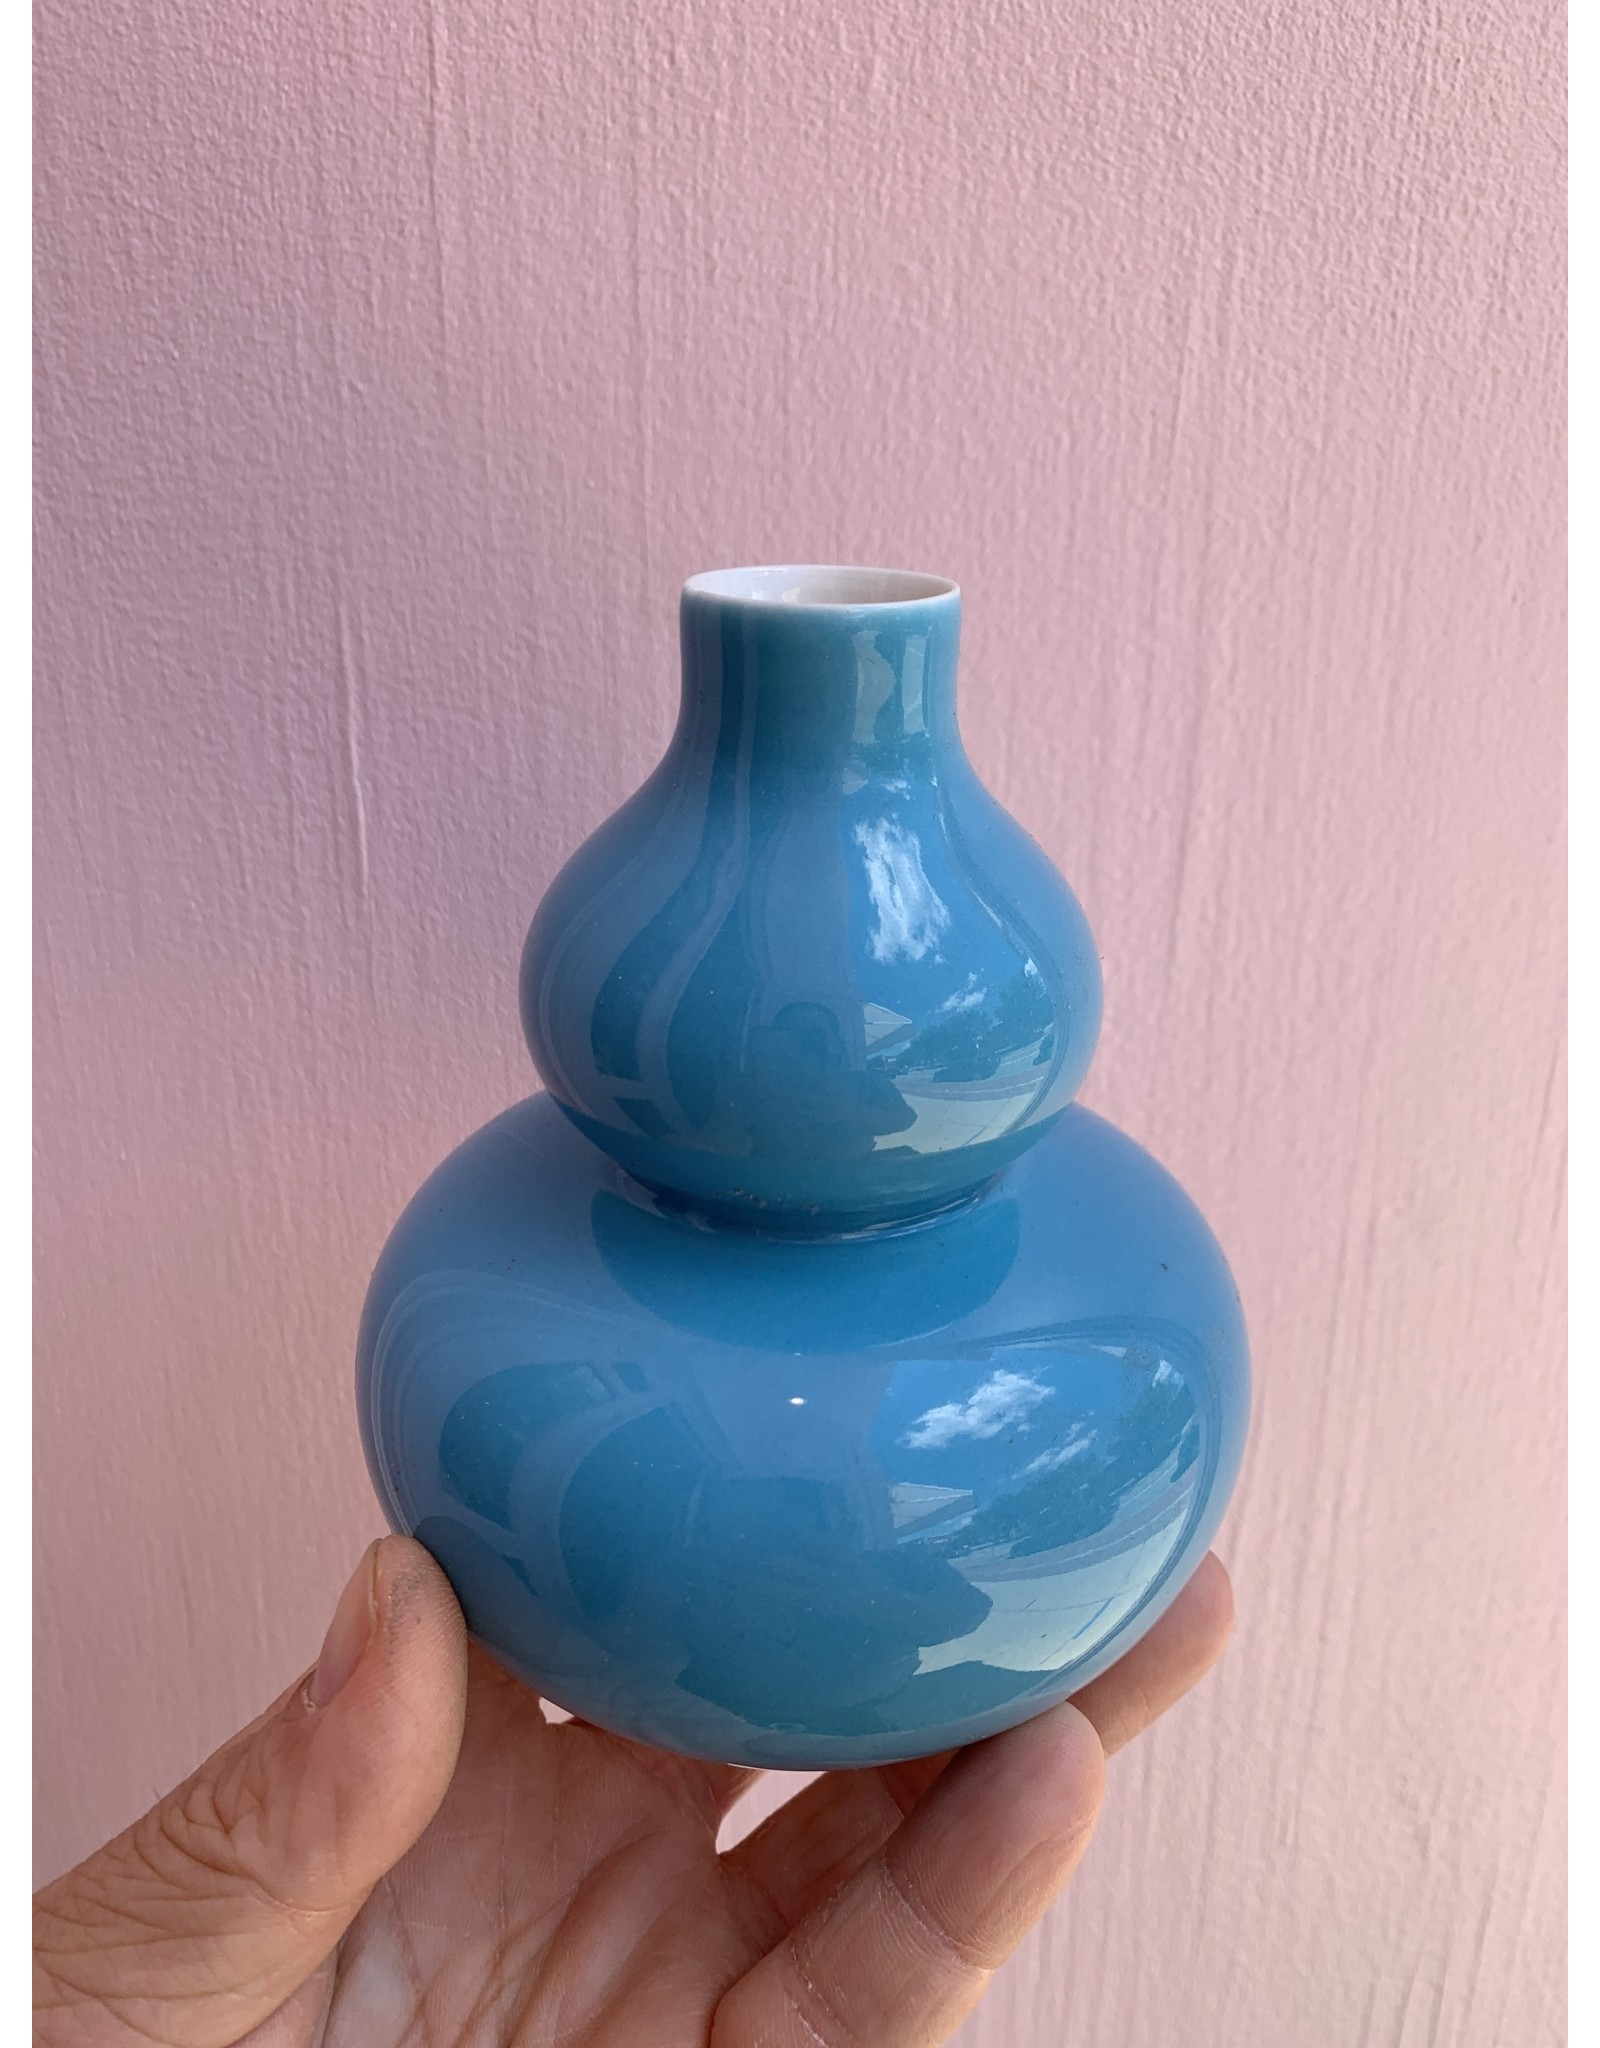 Middle Kingdom Mini Vase Double Gourd Turquoise